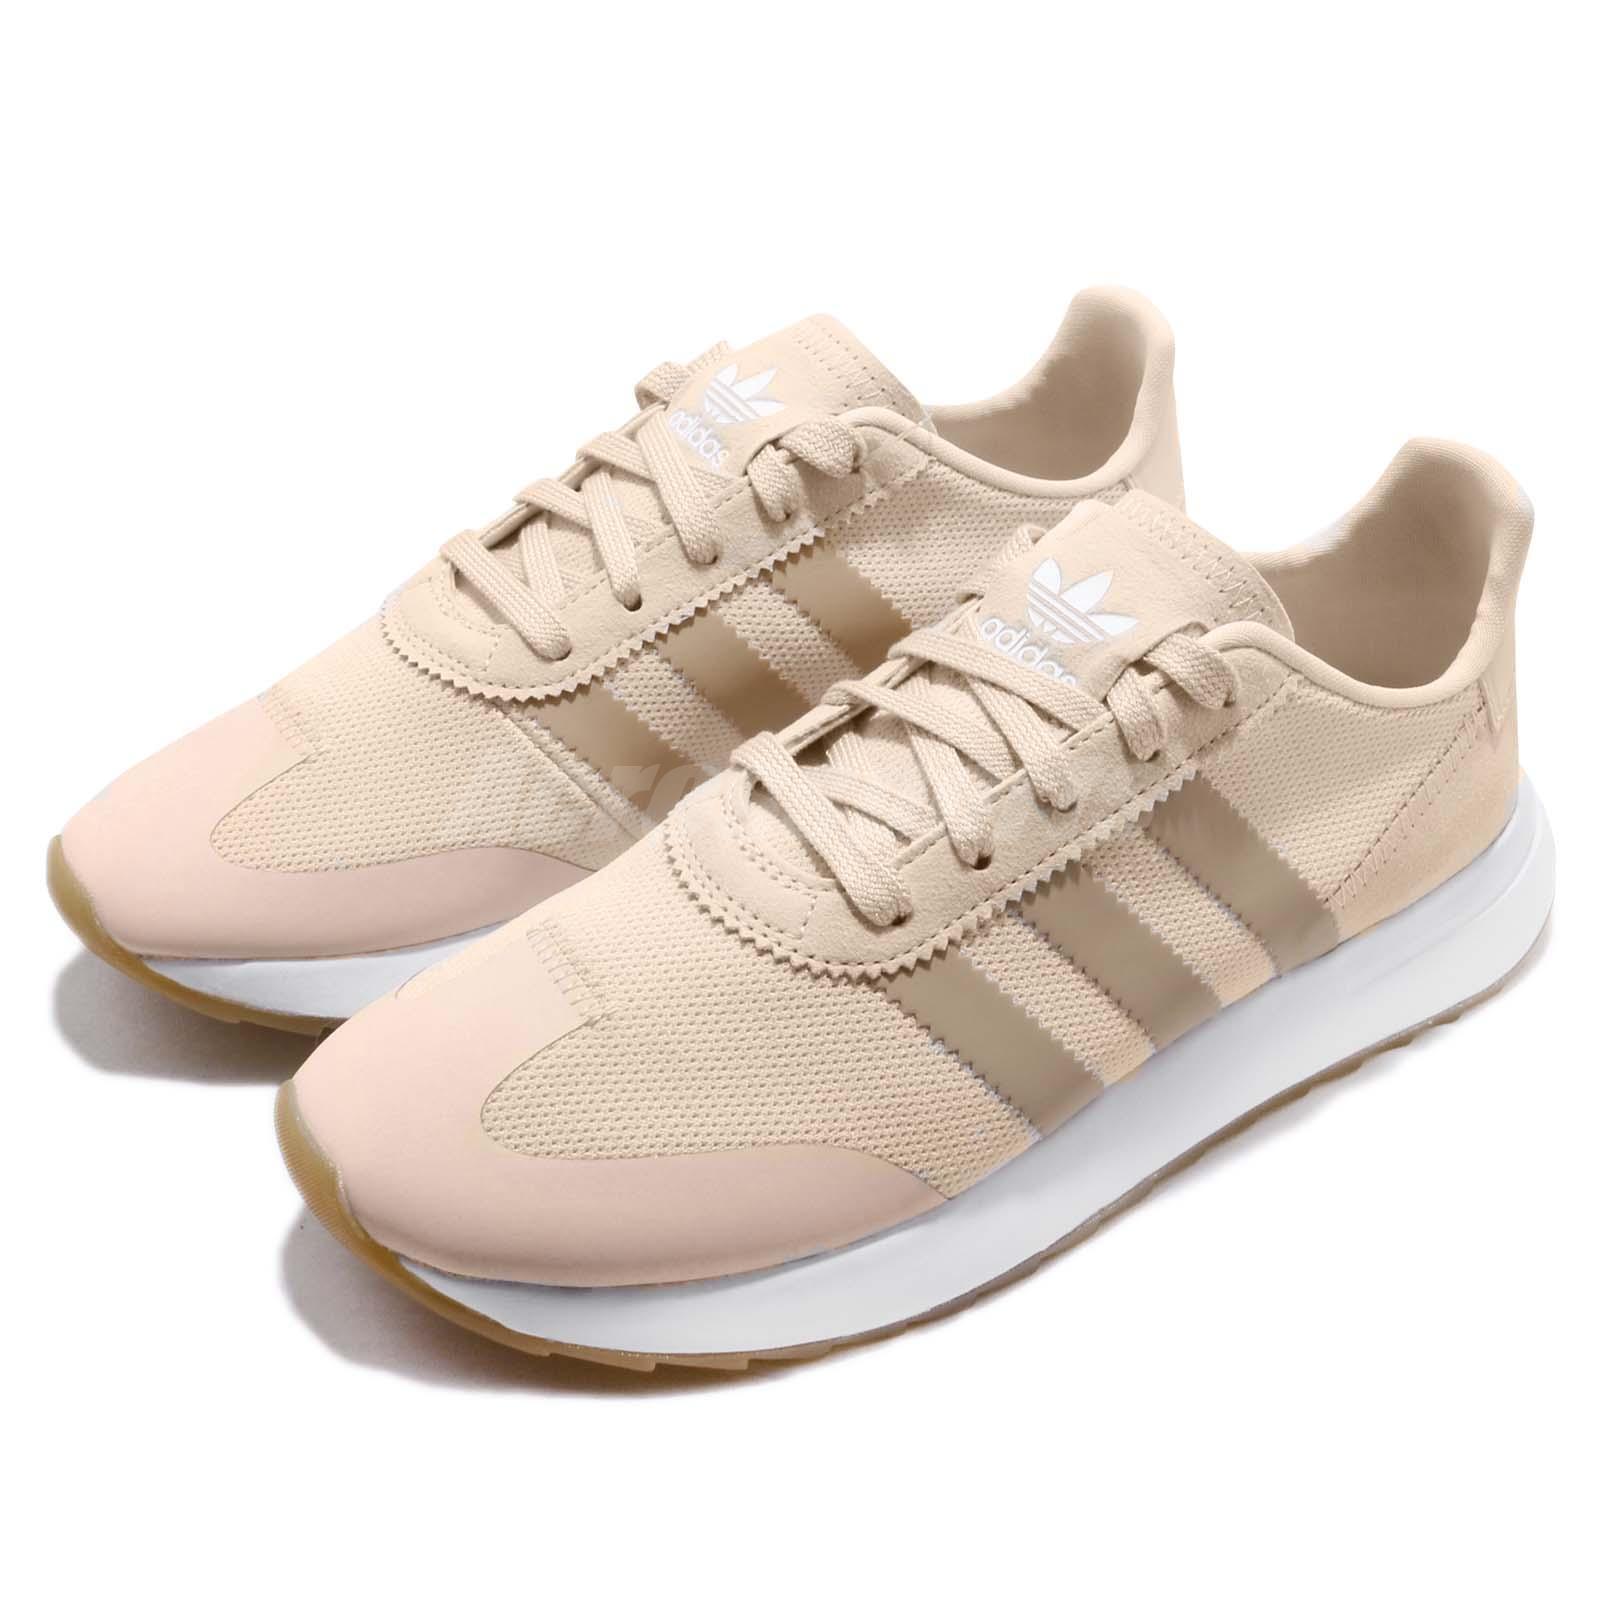 Adidas Originals FLB_Runner W Linen Ash Pearl Gum mujer mujer mujer Running zapatos B28181  ventas en linea